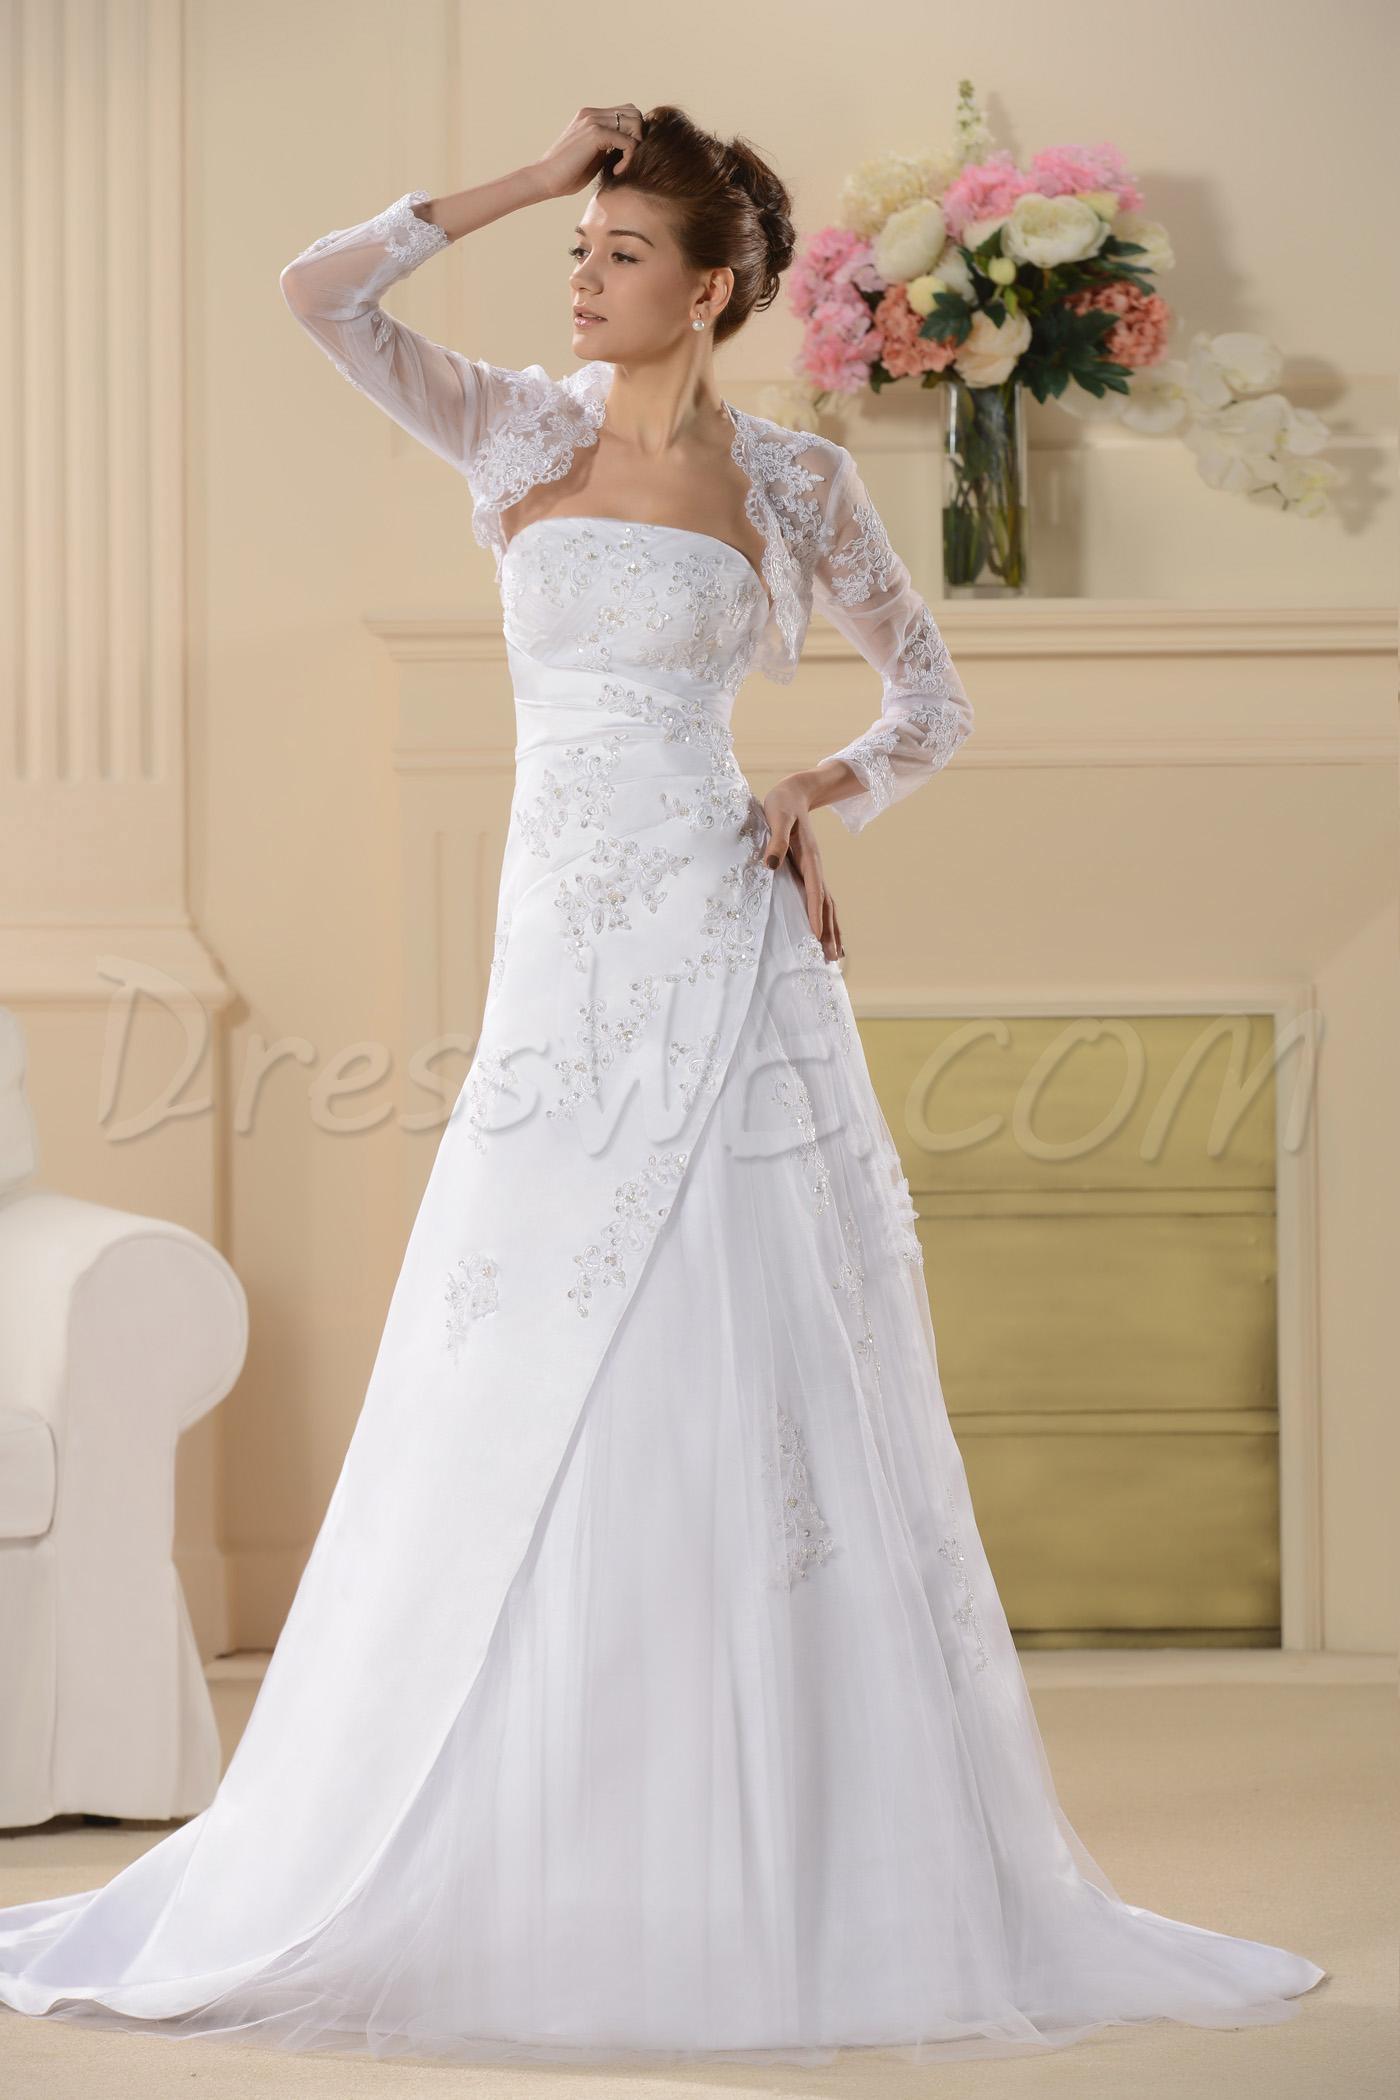 Princess Wedding Dresses Strapless : Short puffy prom dress buy dresses